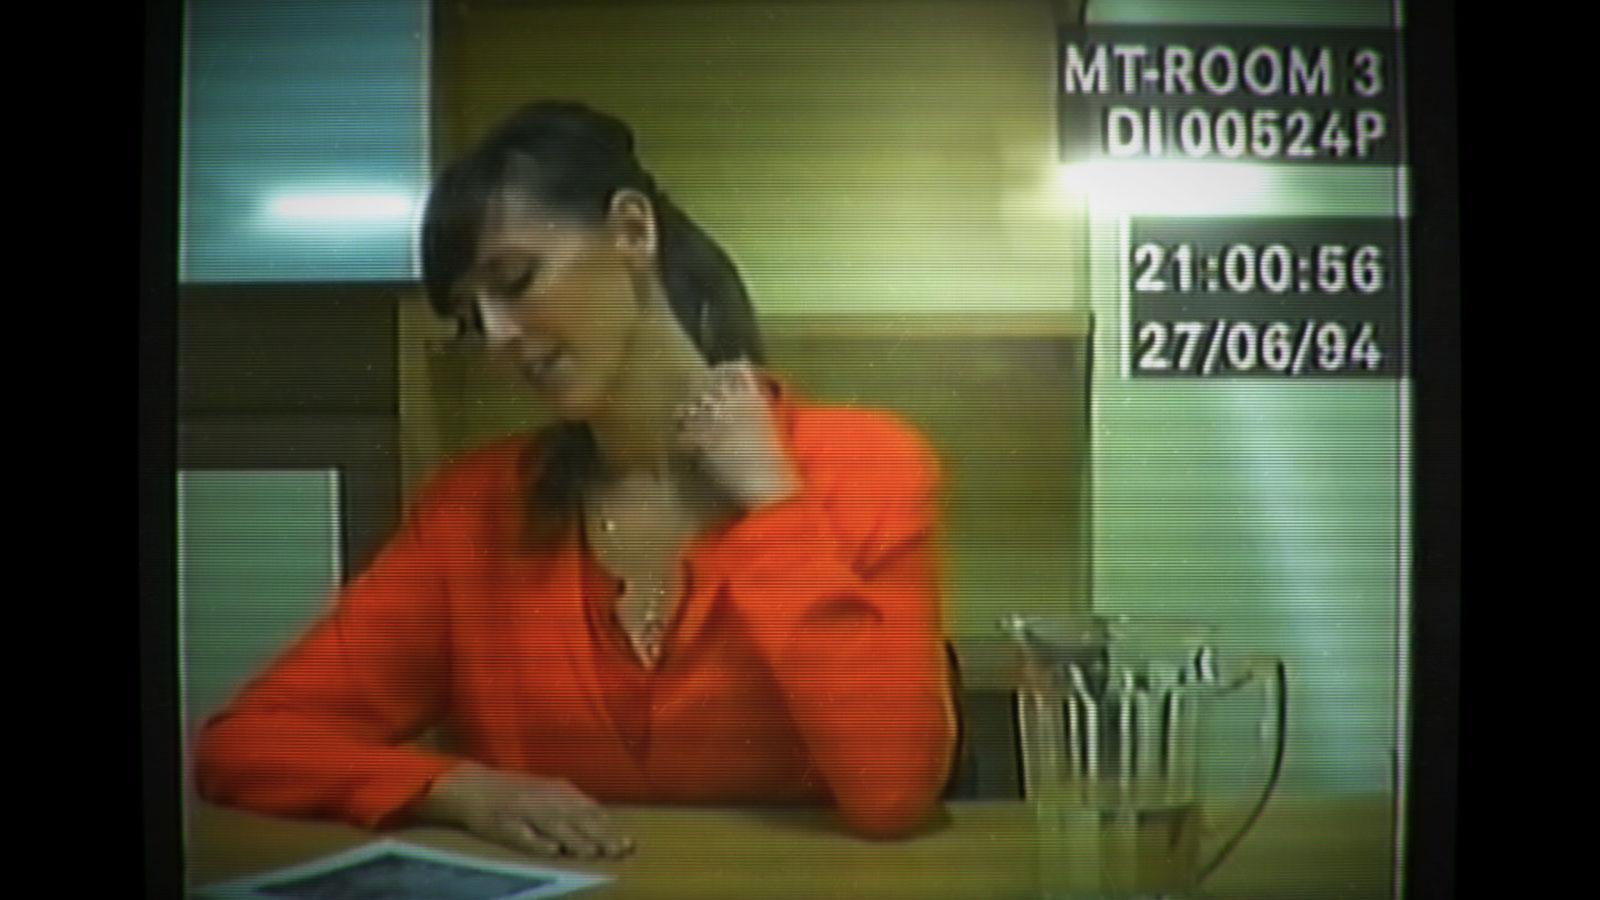 Her story детектив на допросе